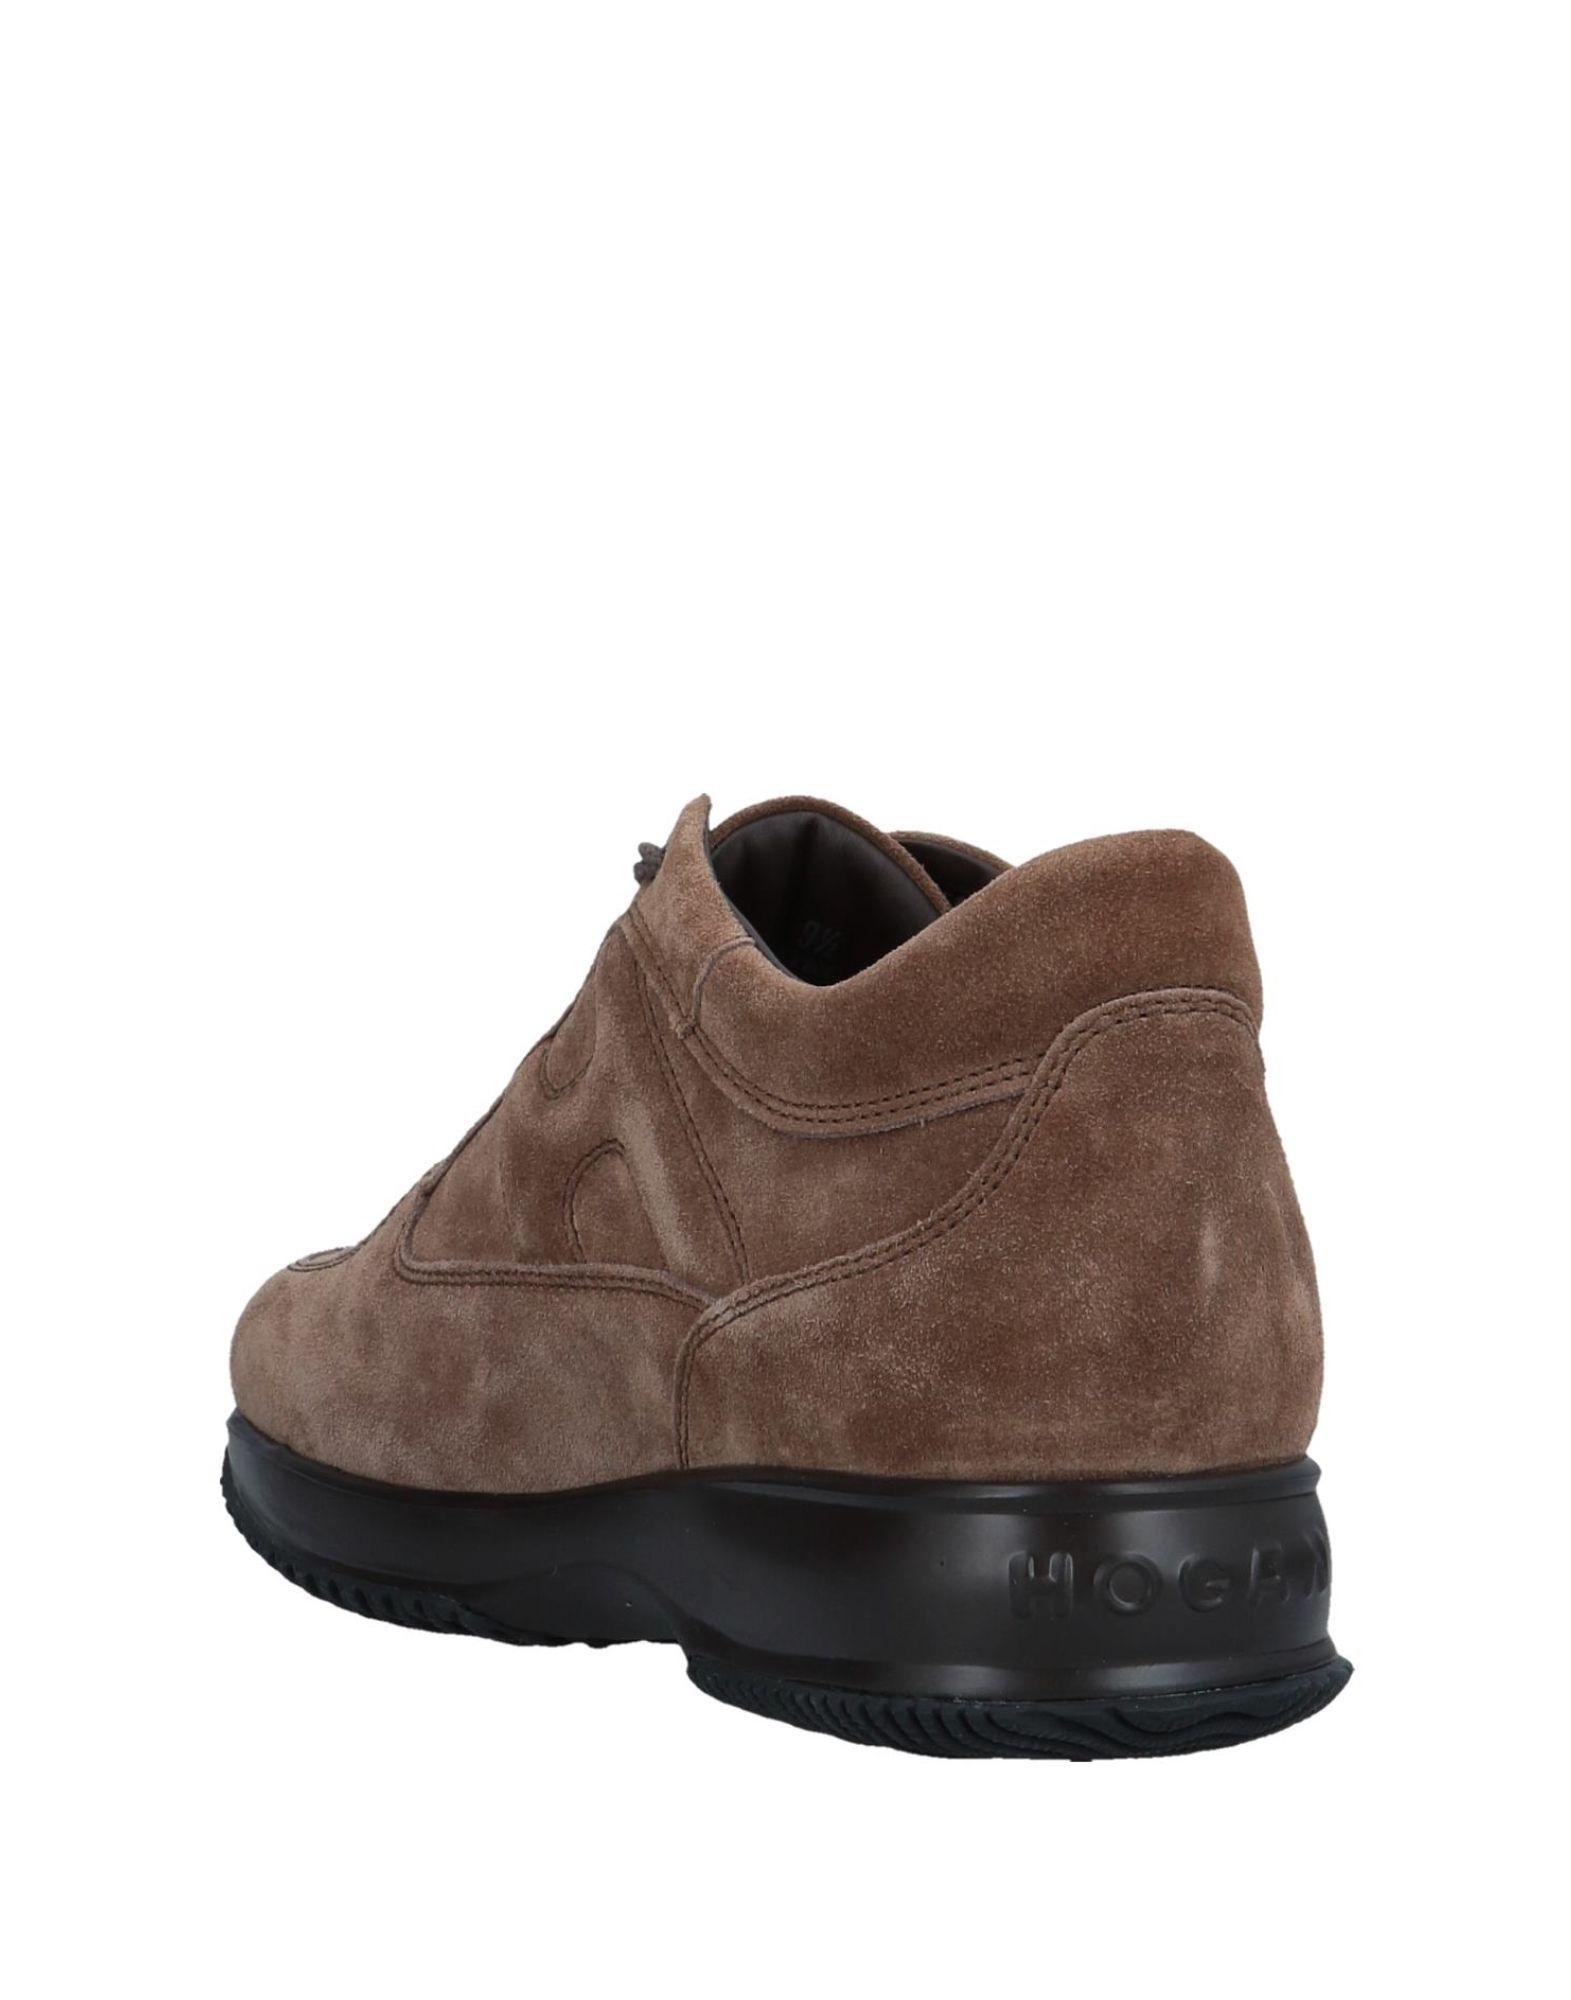 Hogan Sneakers Herren  11560724PV Gute Qualität beliebte Schuhe